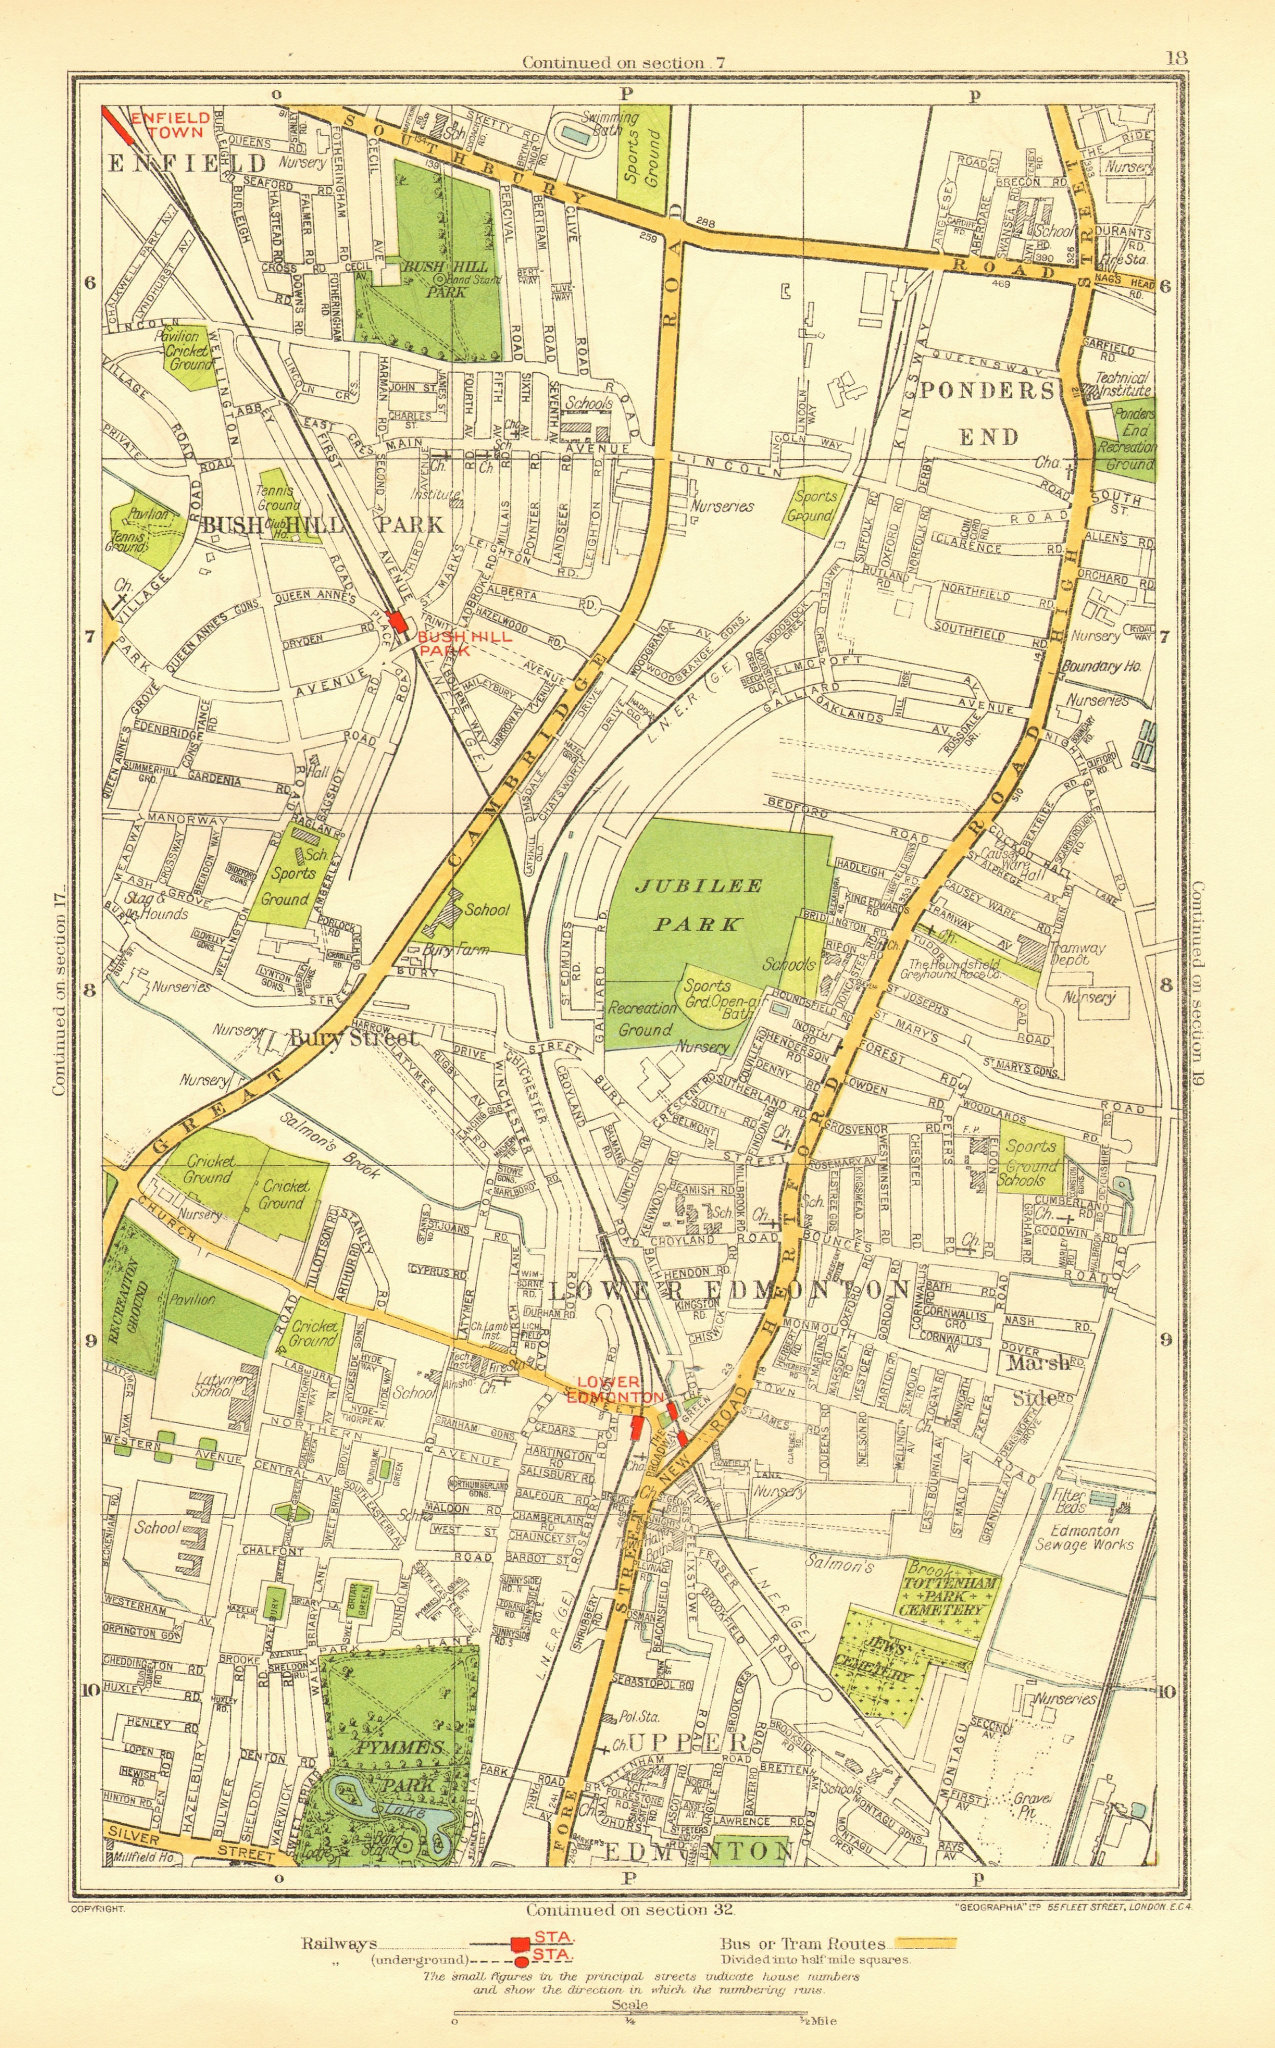 Associate Product EDMONTON. Bush Hill Park Ponders End Enfield Town Bury Street 1937 old map